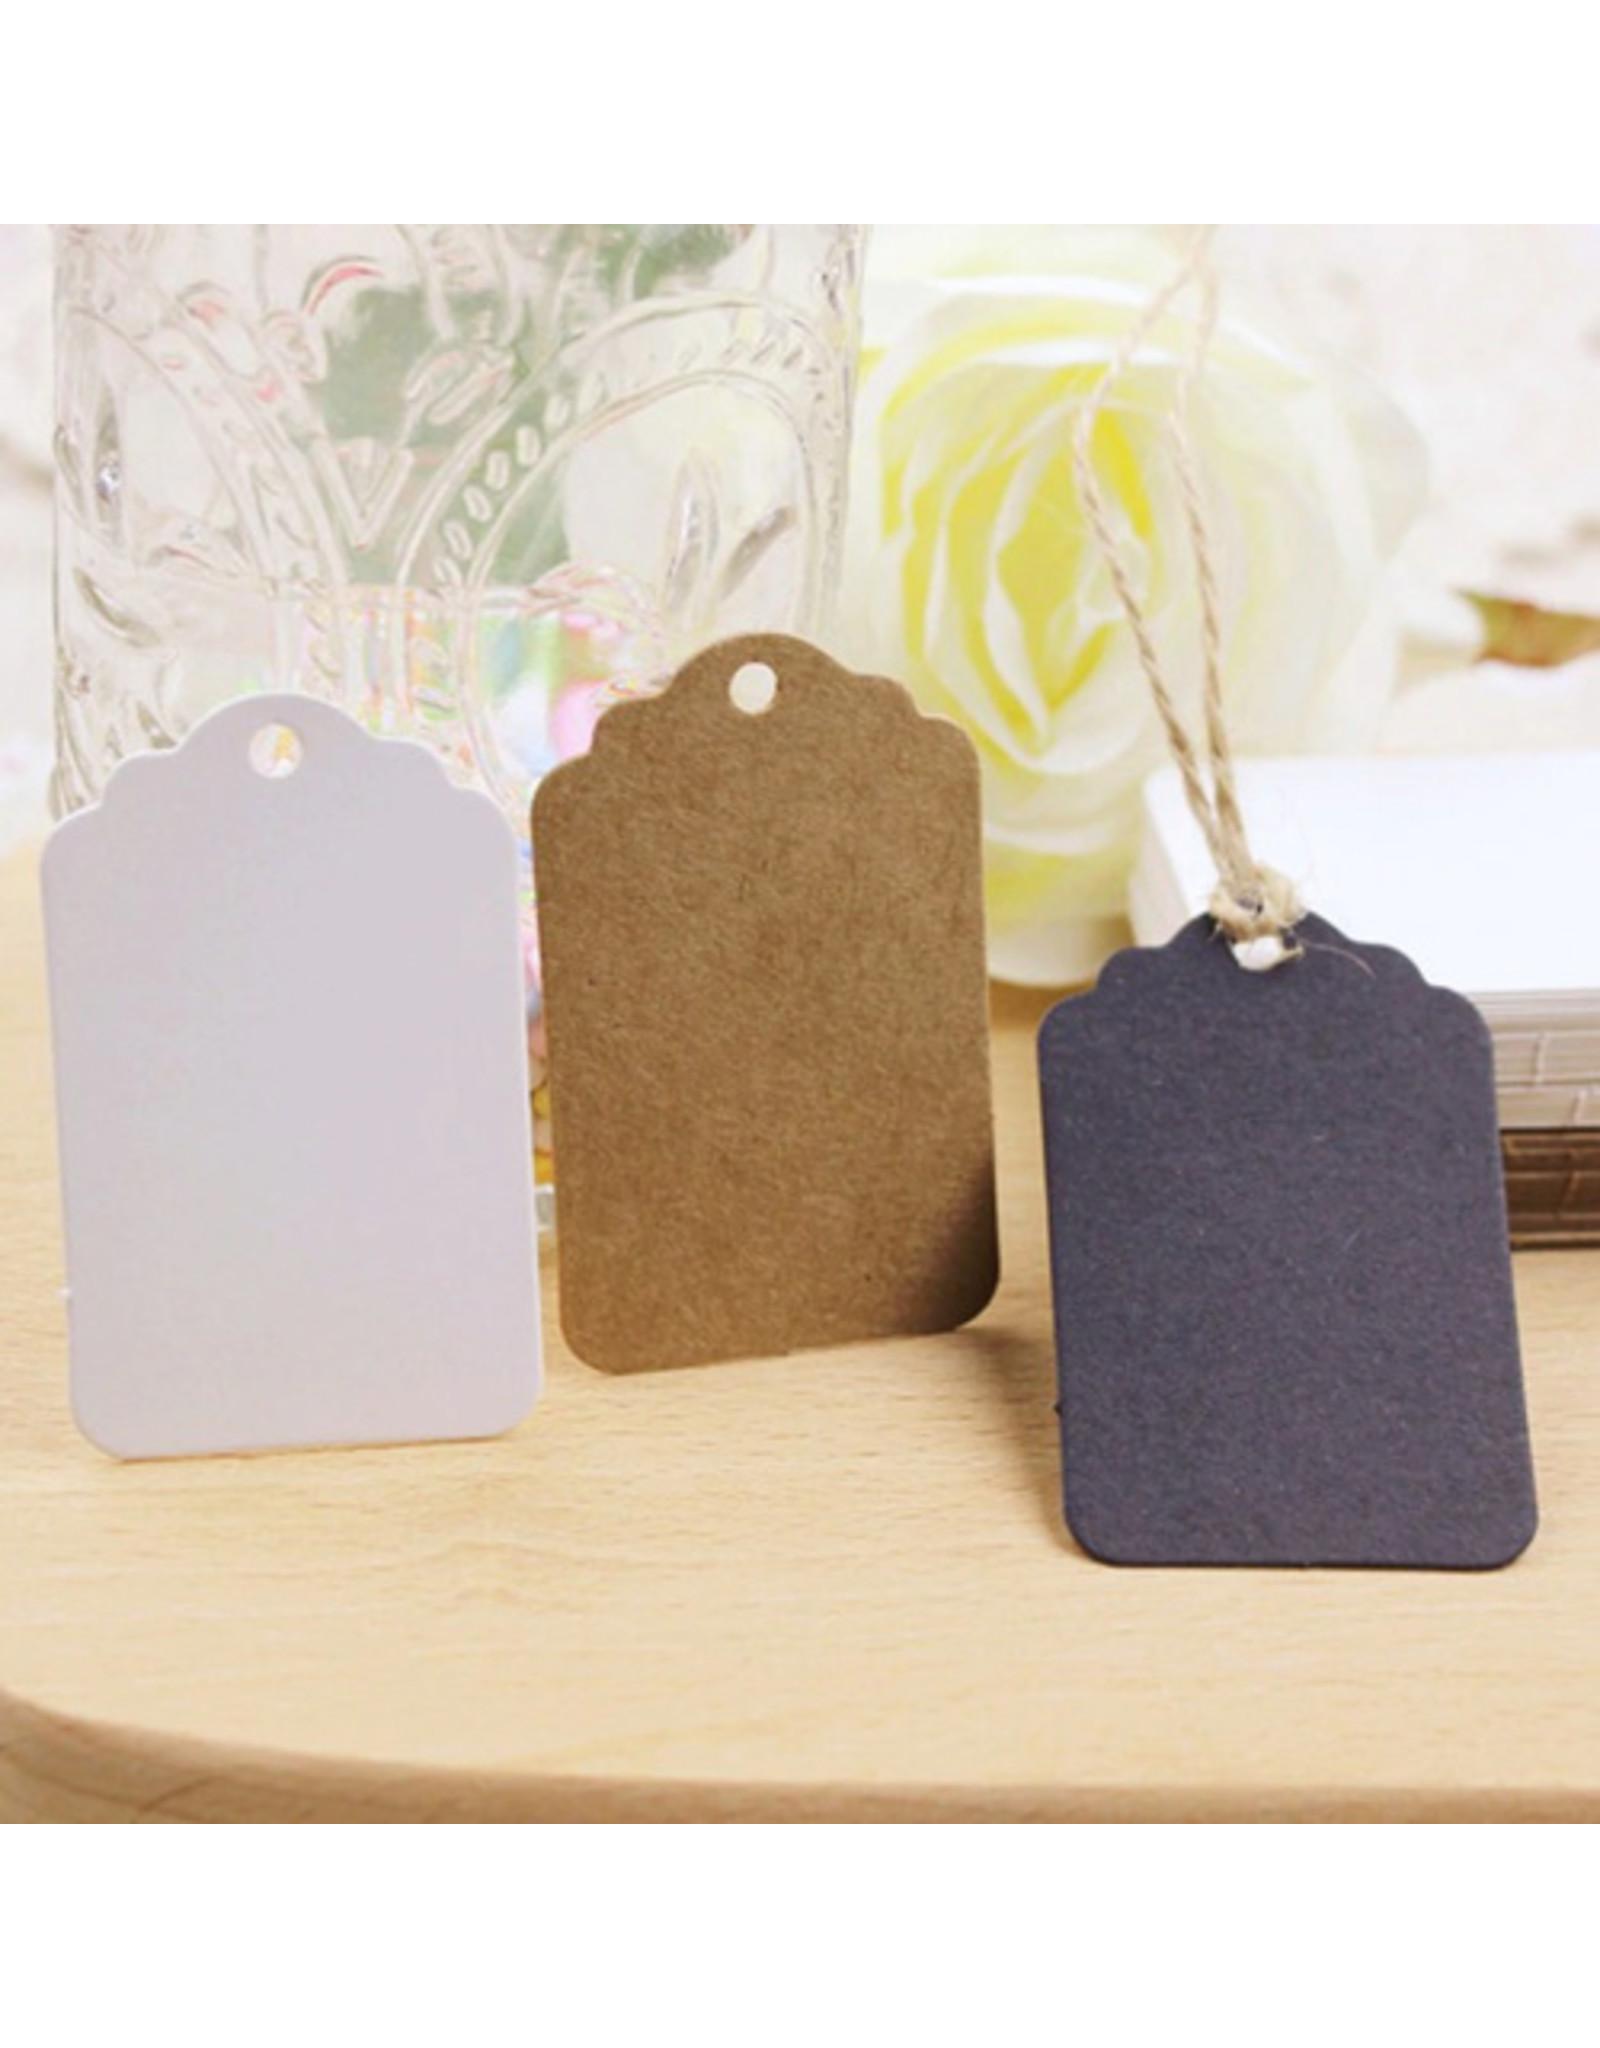 Tags rectangle 5x3 cm (per 100 pieces)